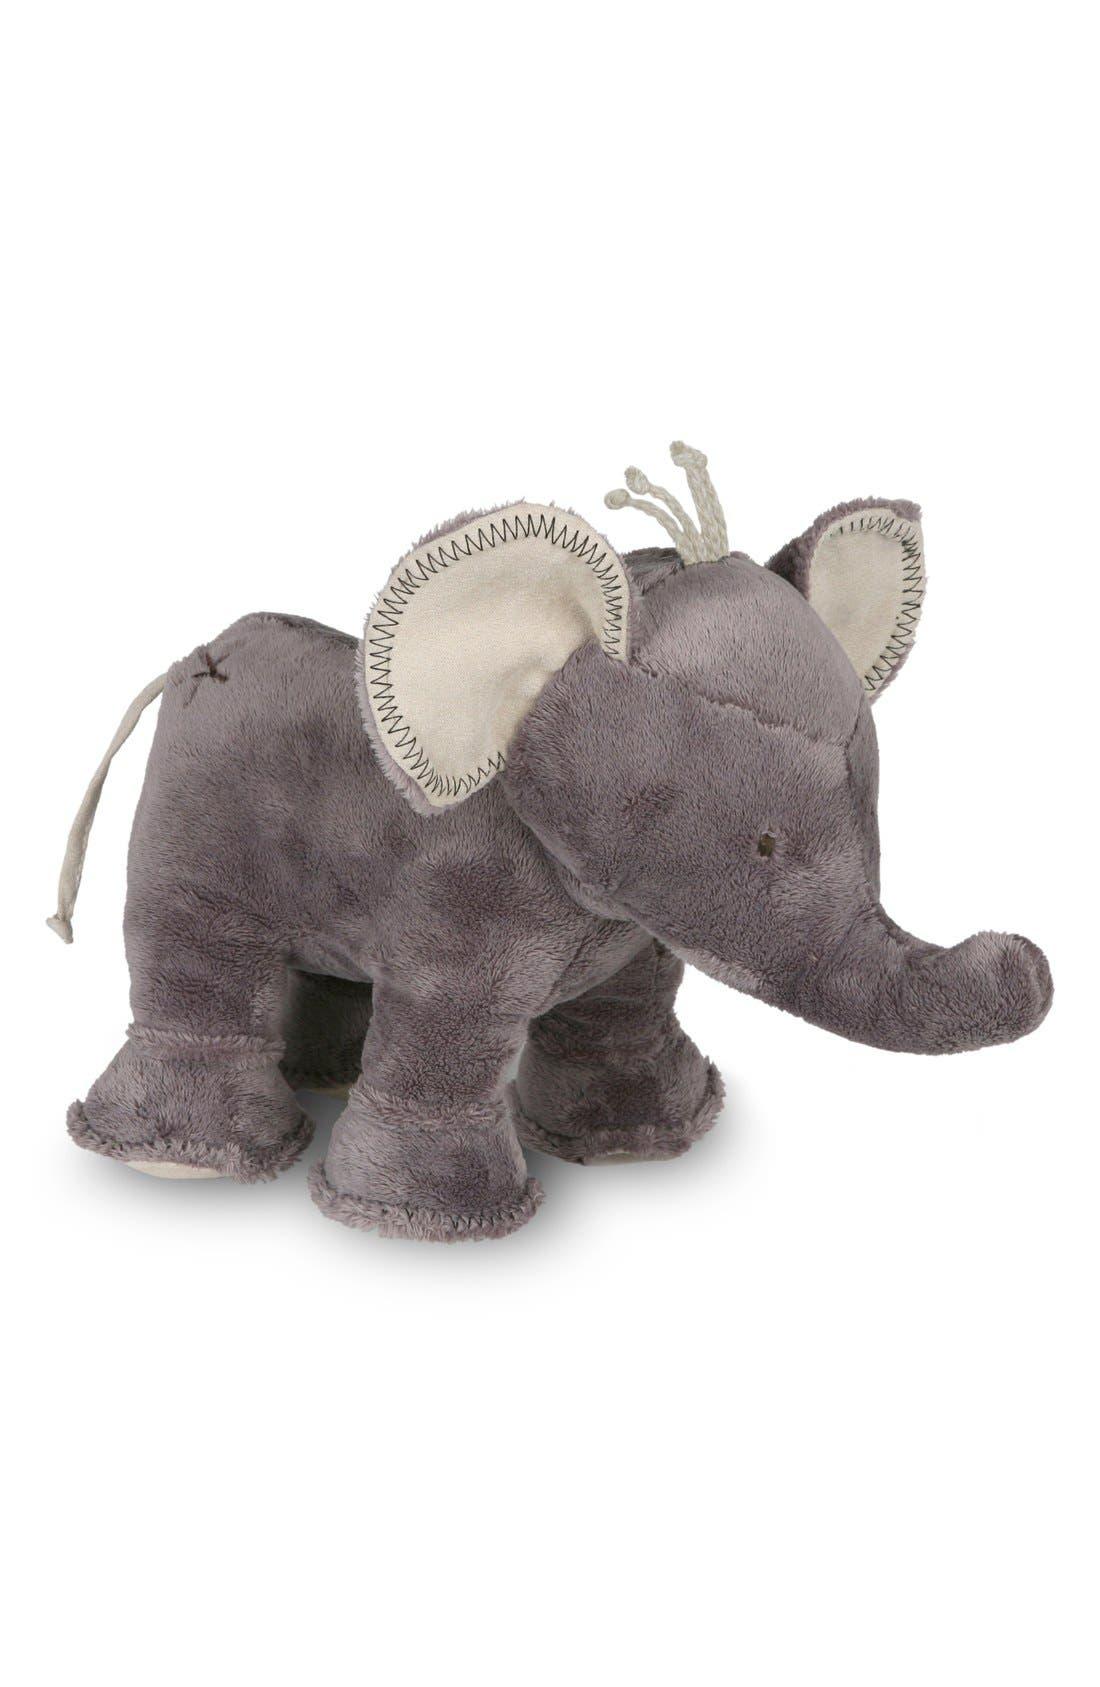 'Buddy the Elephant' Stuffed Animal,                             Alternate thumbnail 2, color,                             Warm Gray